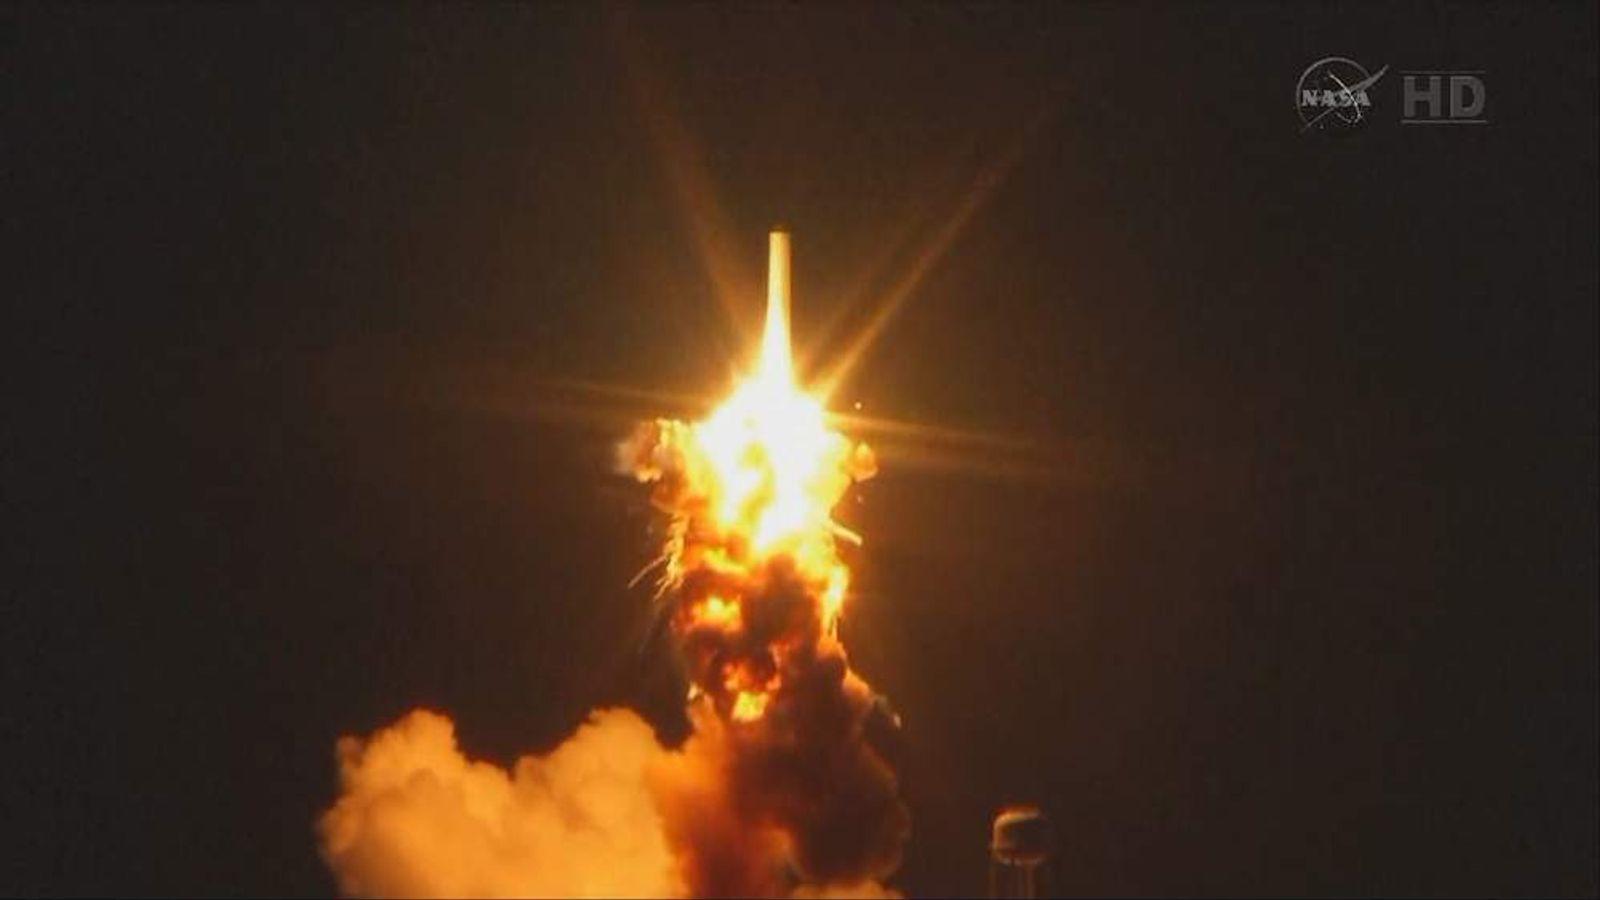 NASA images show rocket launch blast